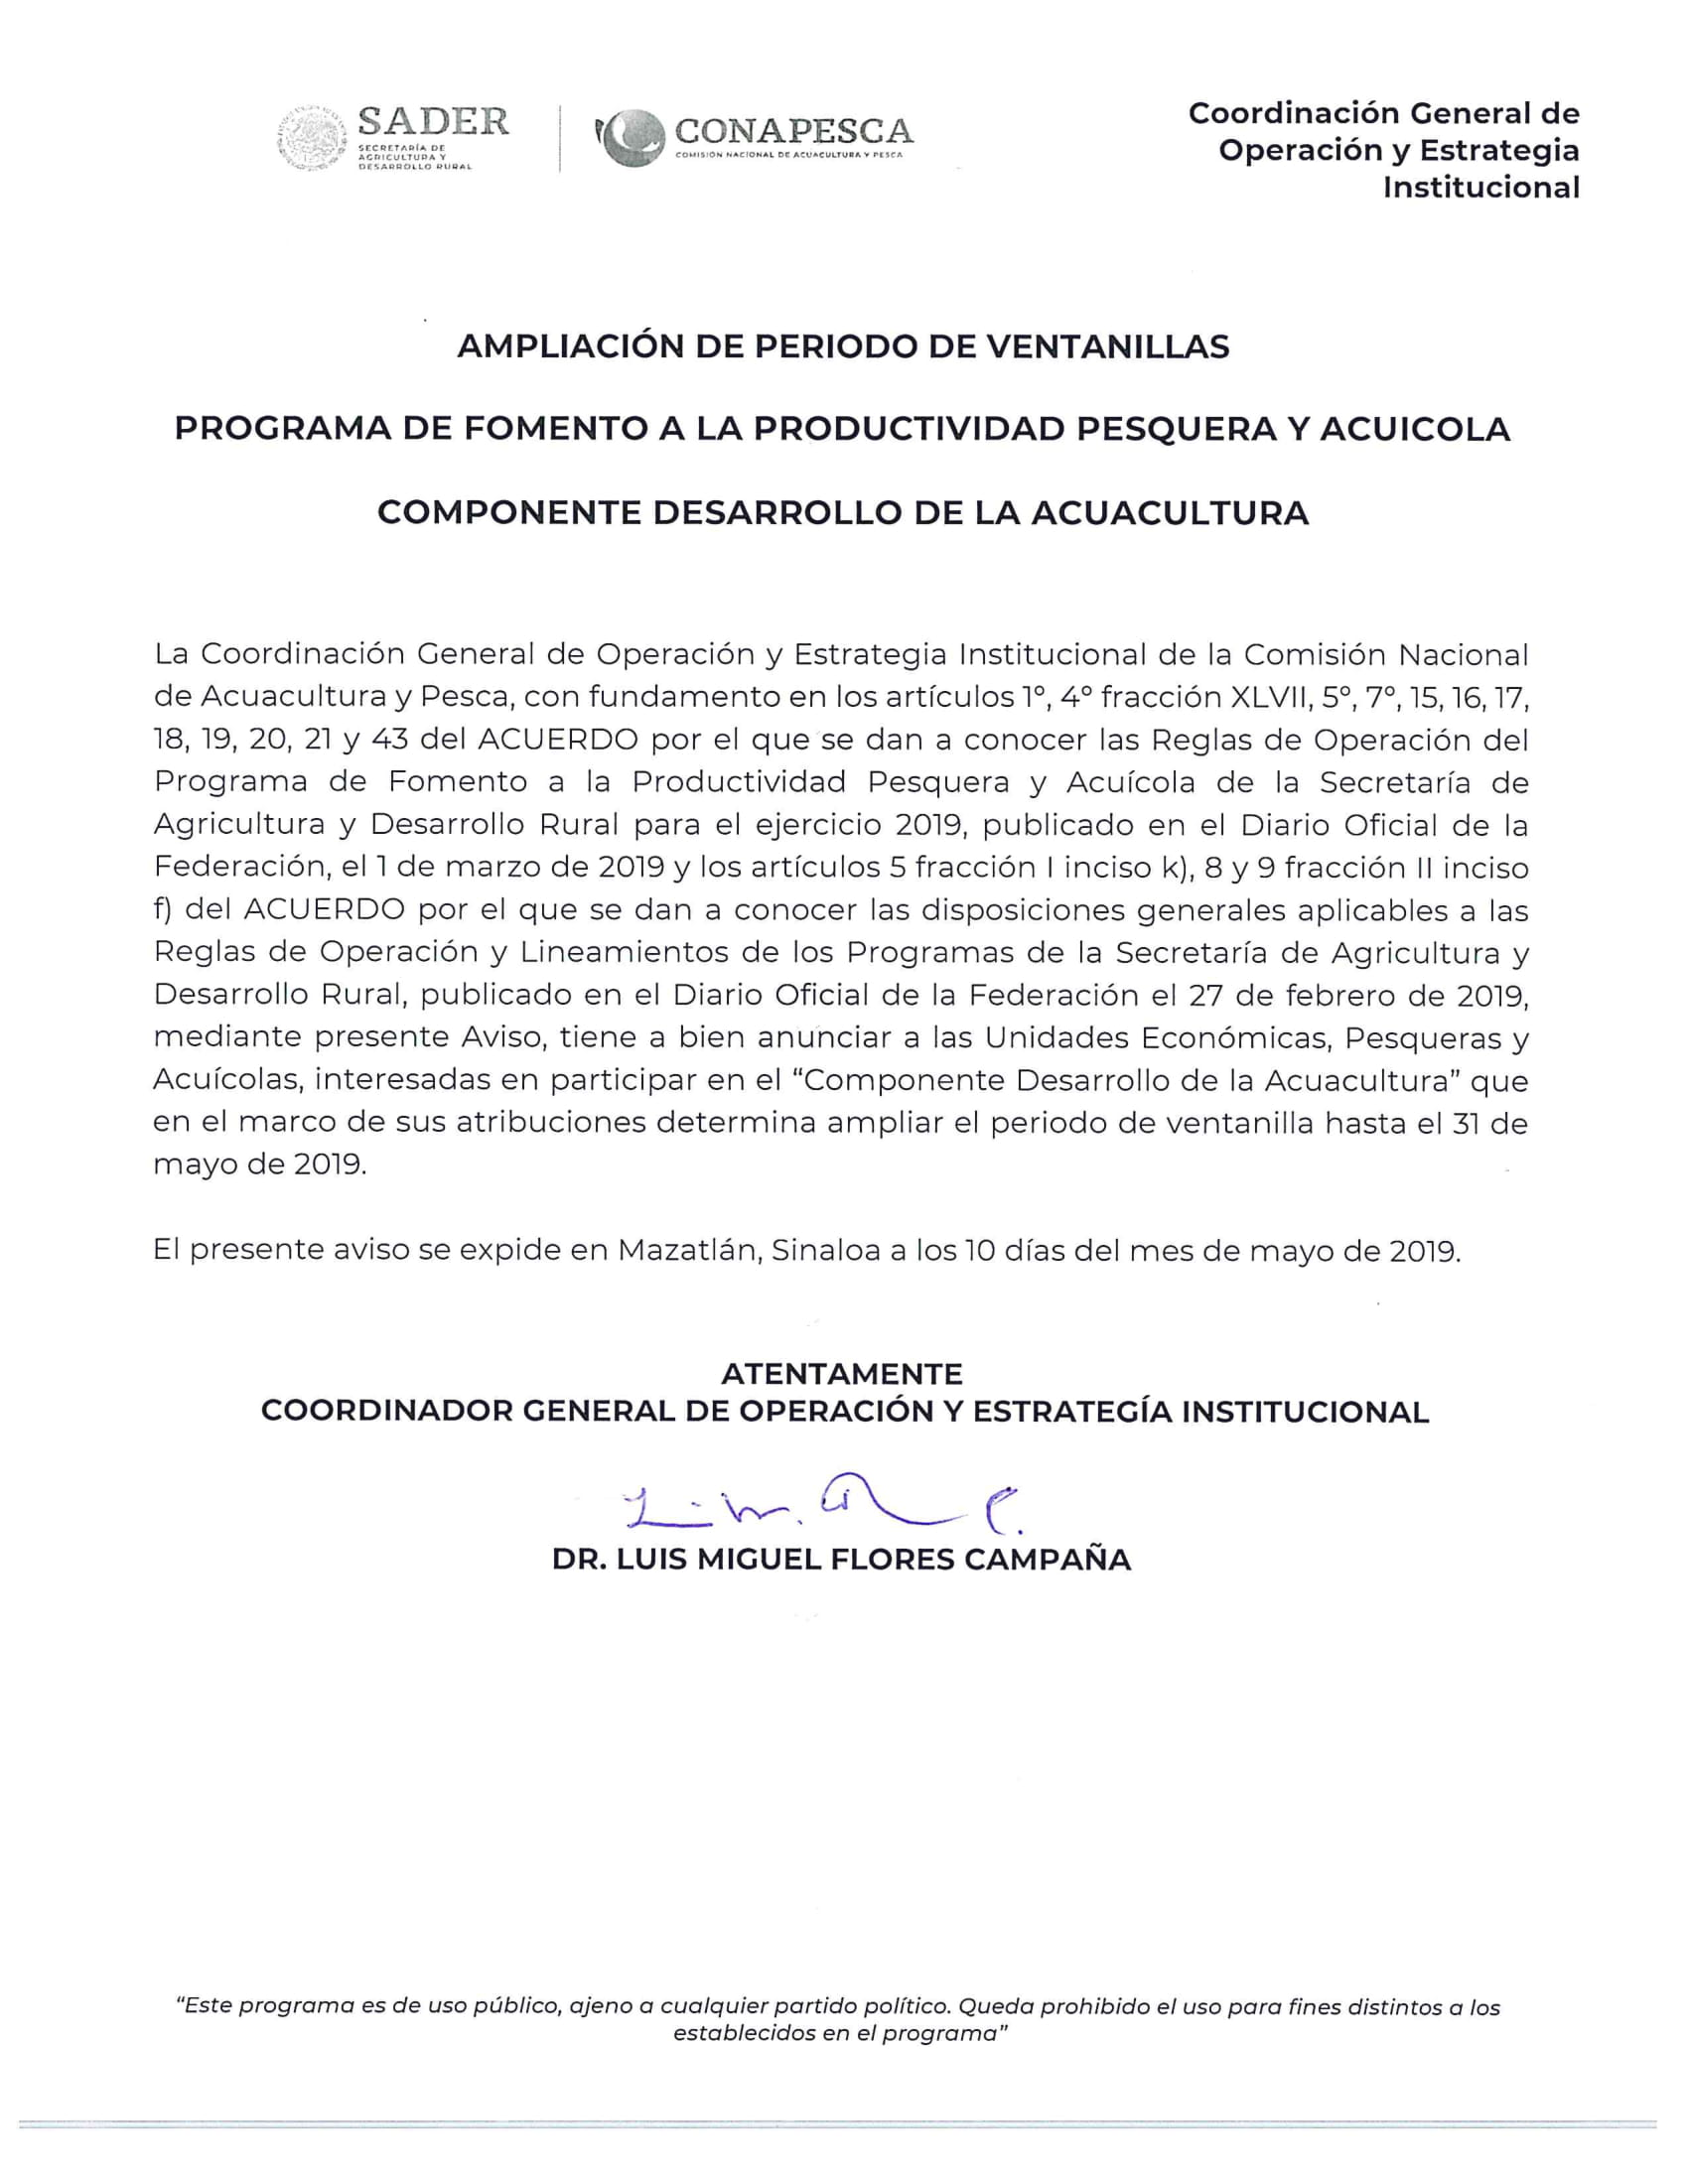 /cms/uploads/image/file/496308/AMPLIACION_VENTANILLA_DA-1.jpg